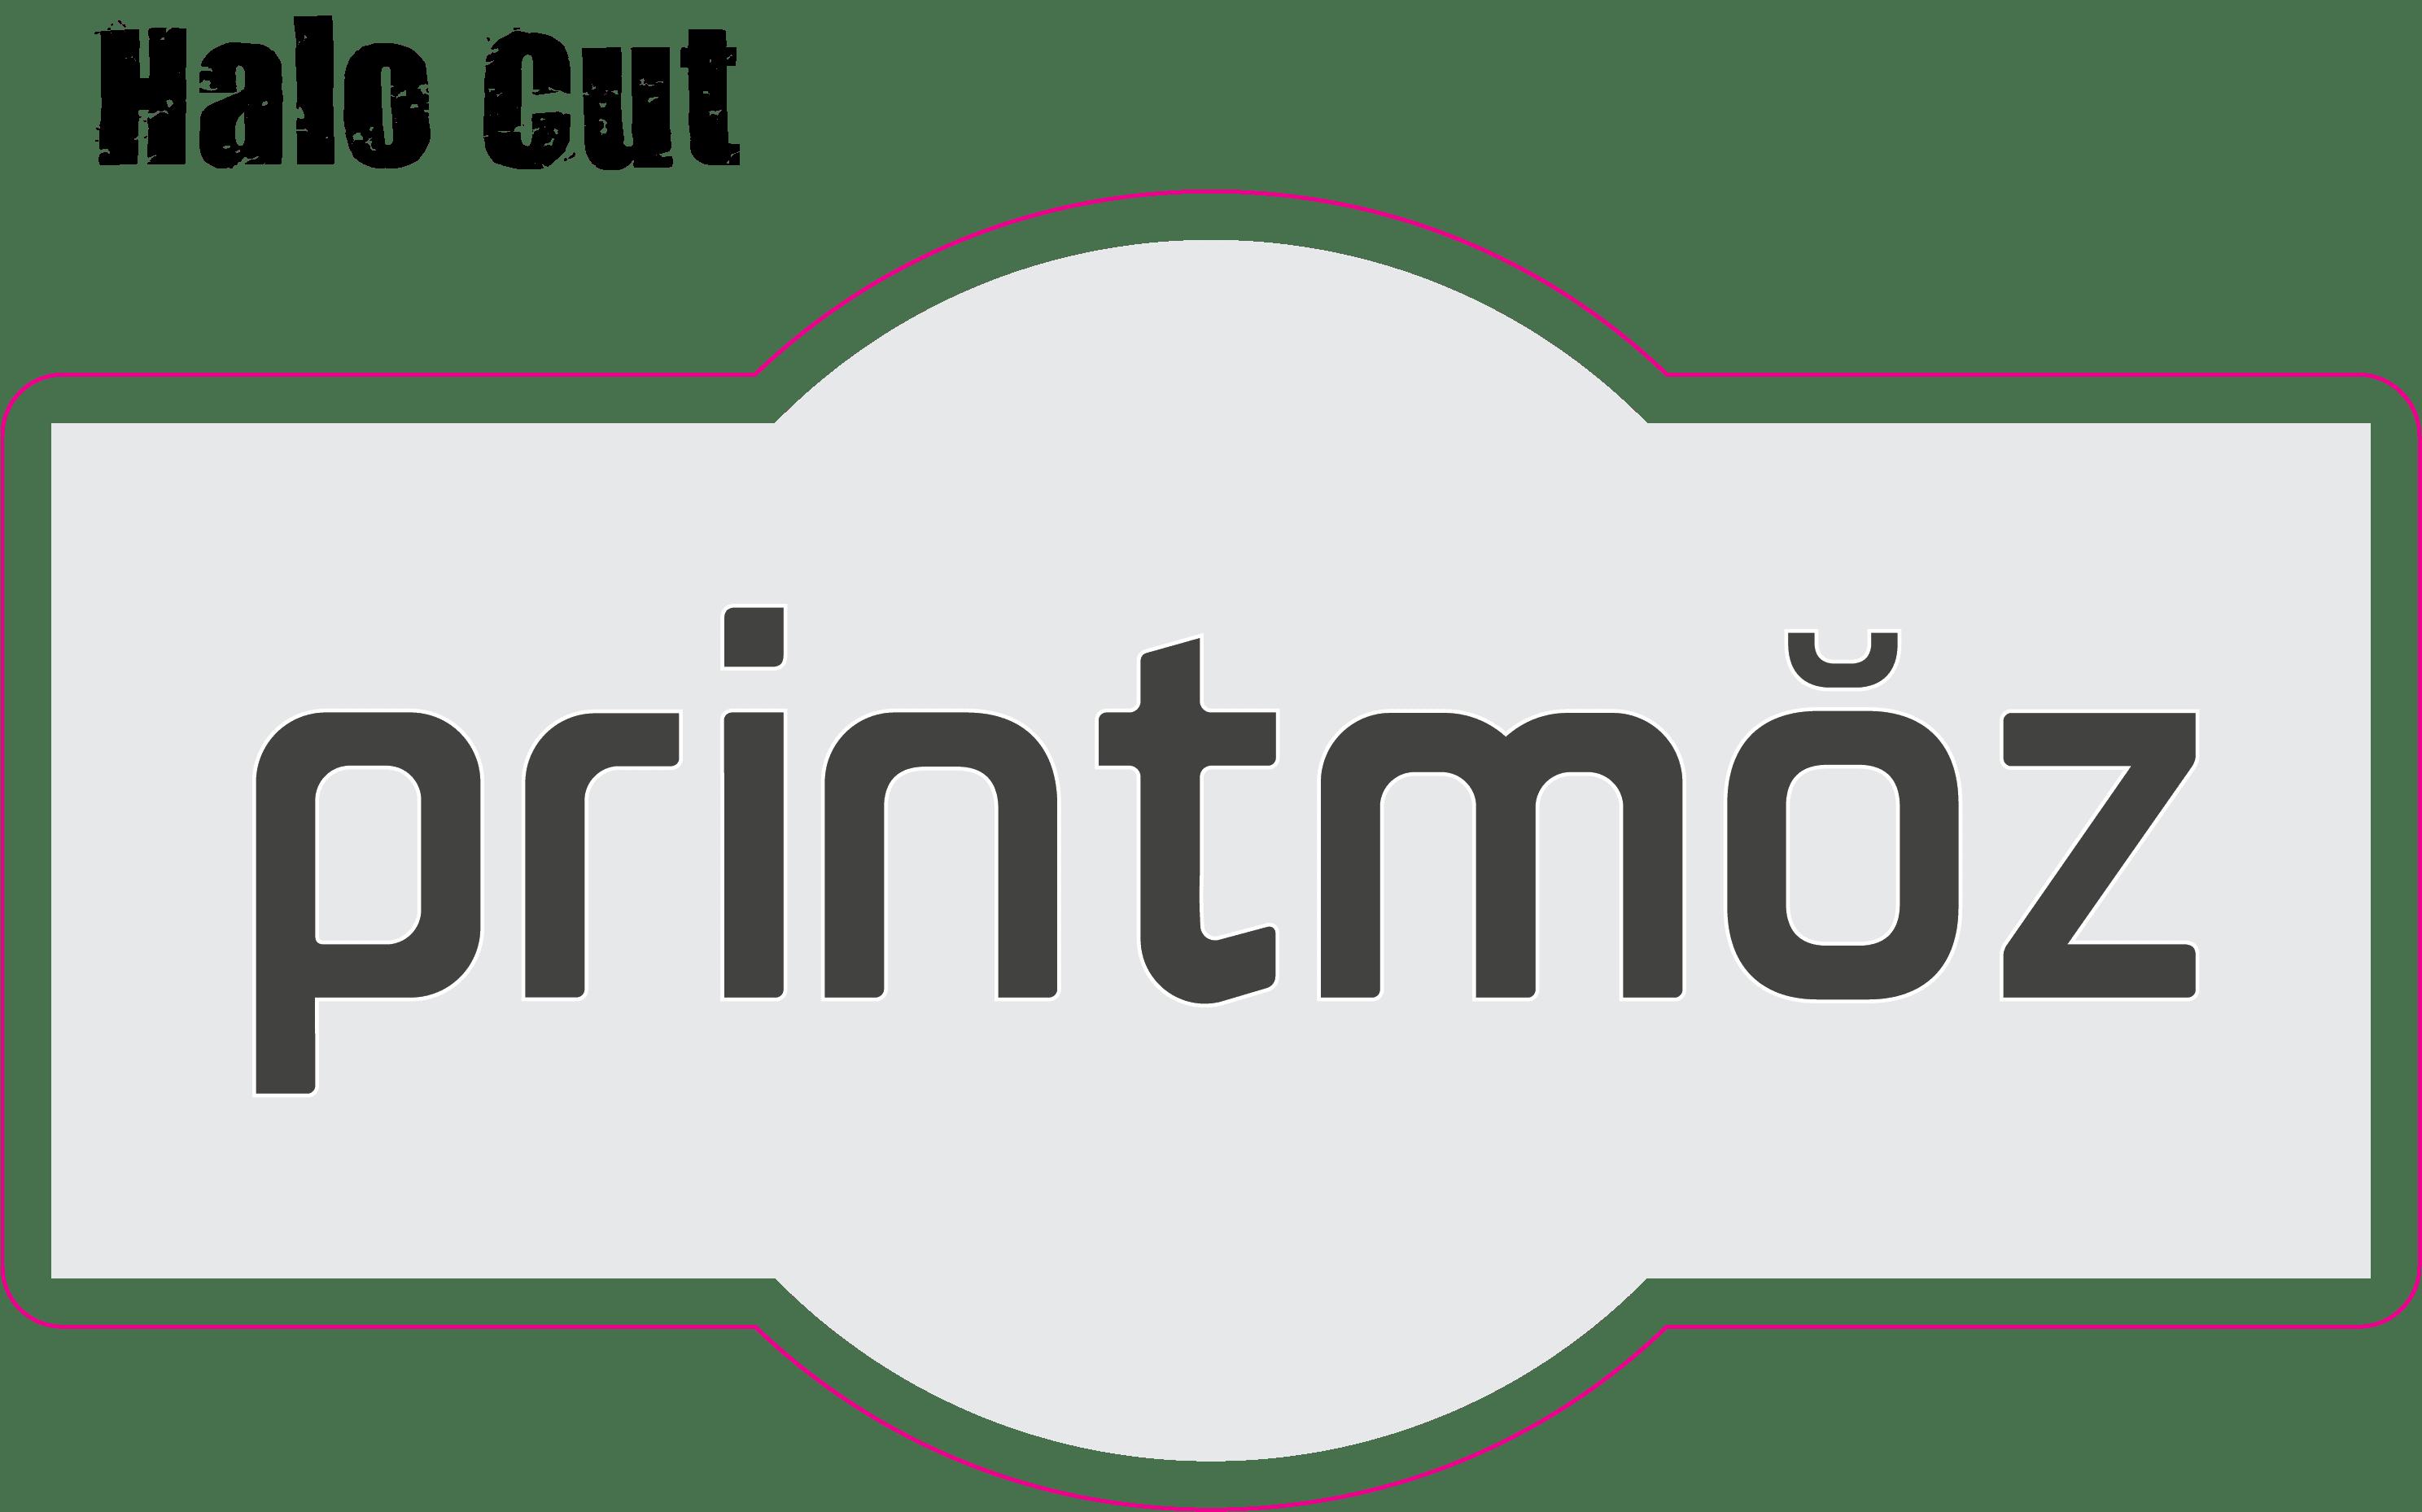 printmoz logo halo cut design